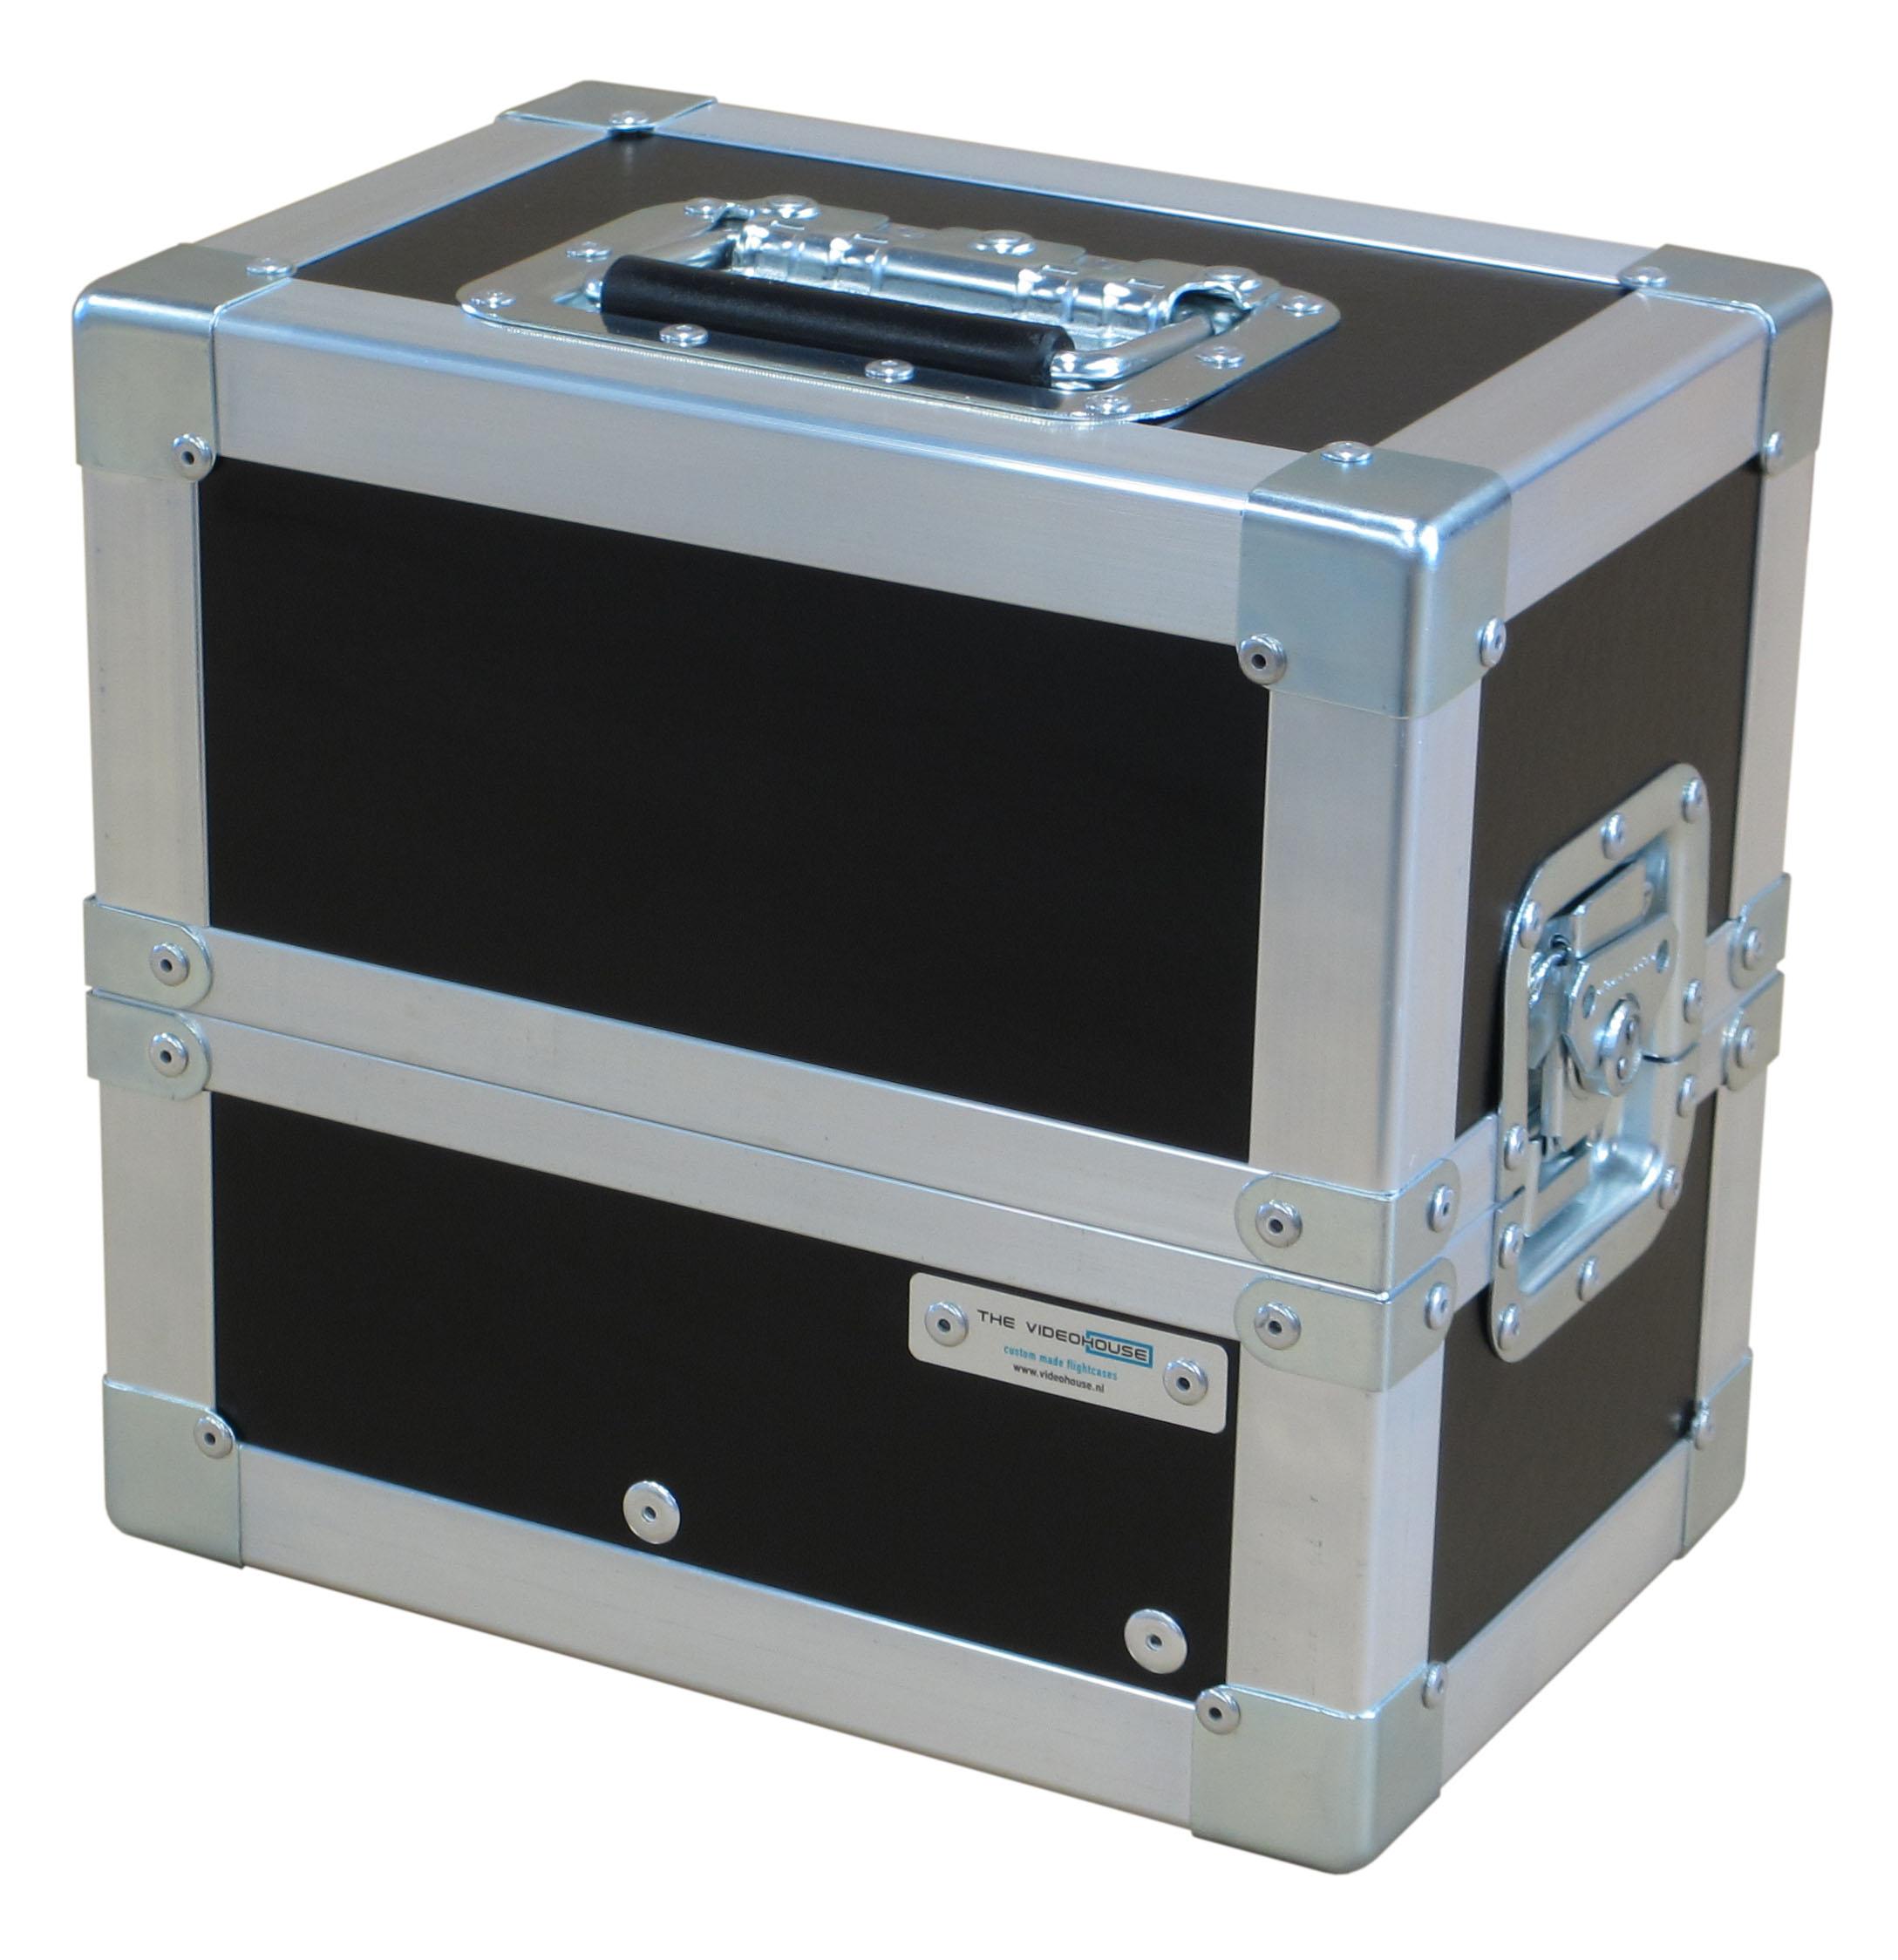 Panasonic AW-HE50S - Holdan Limited